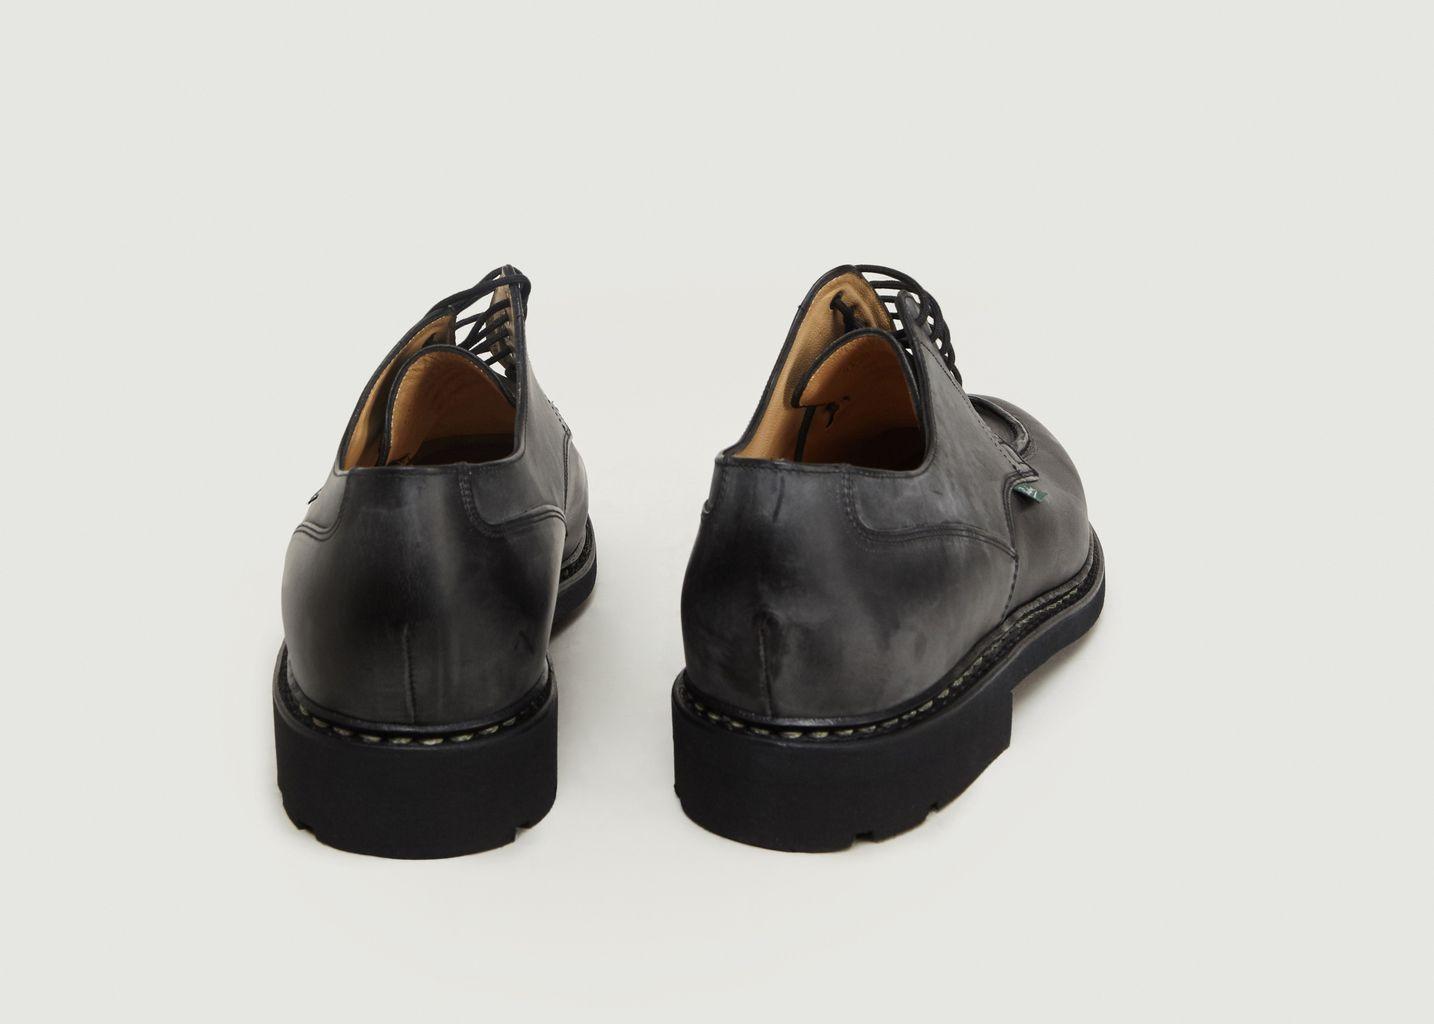 Chambord Shoes